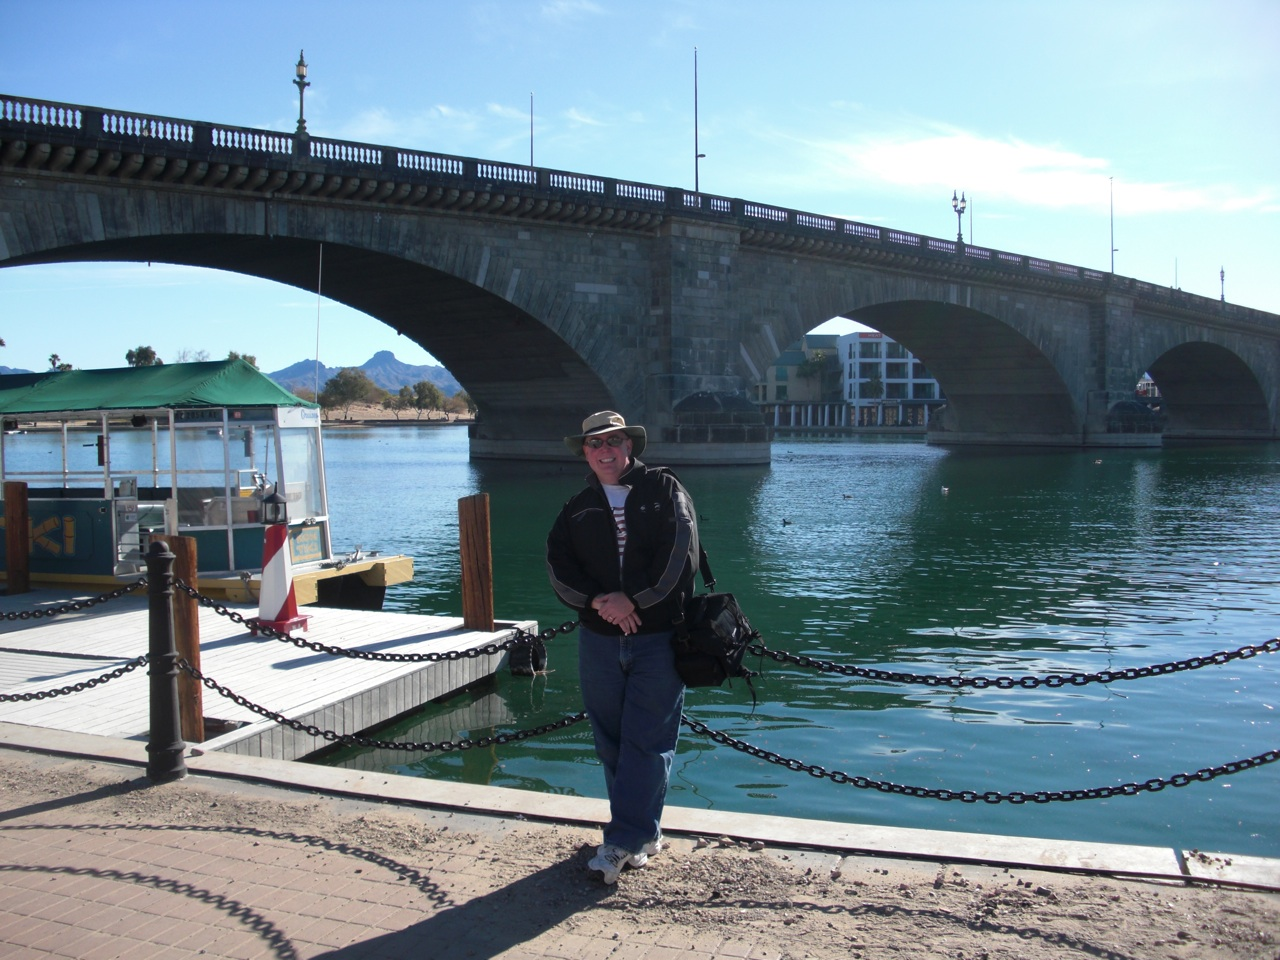 David in front of the London Bridge